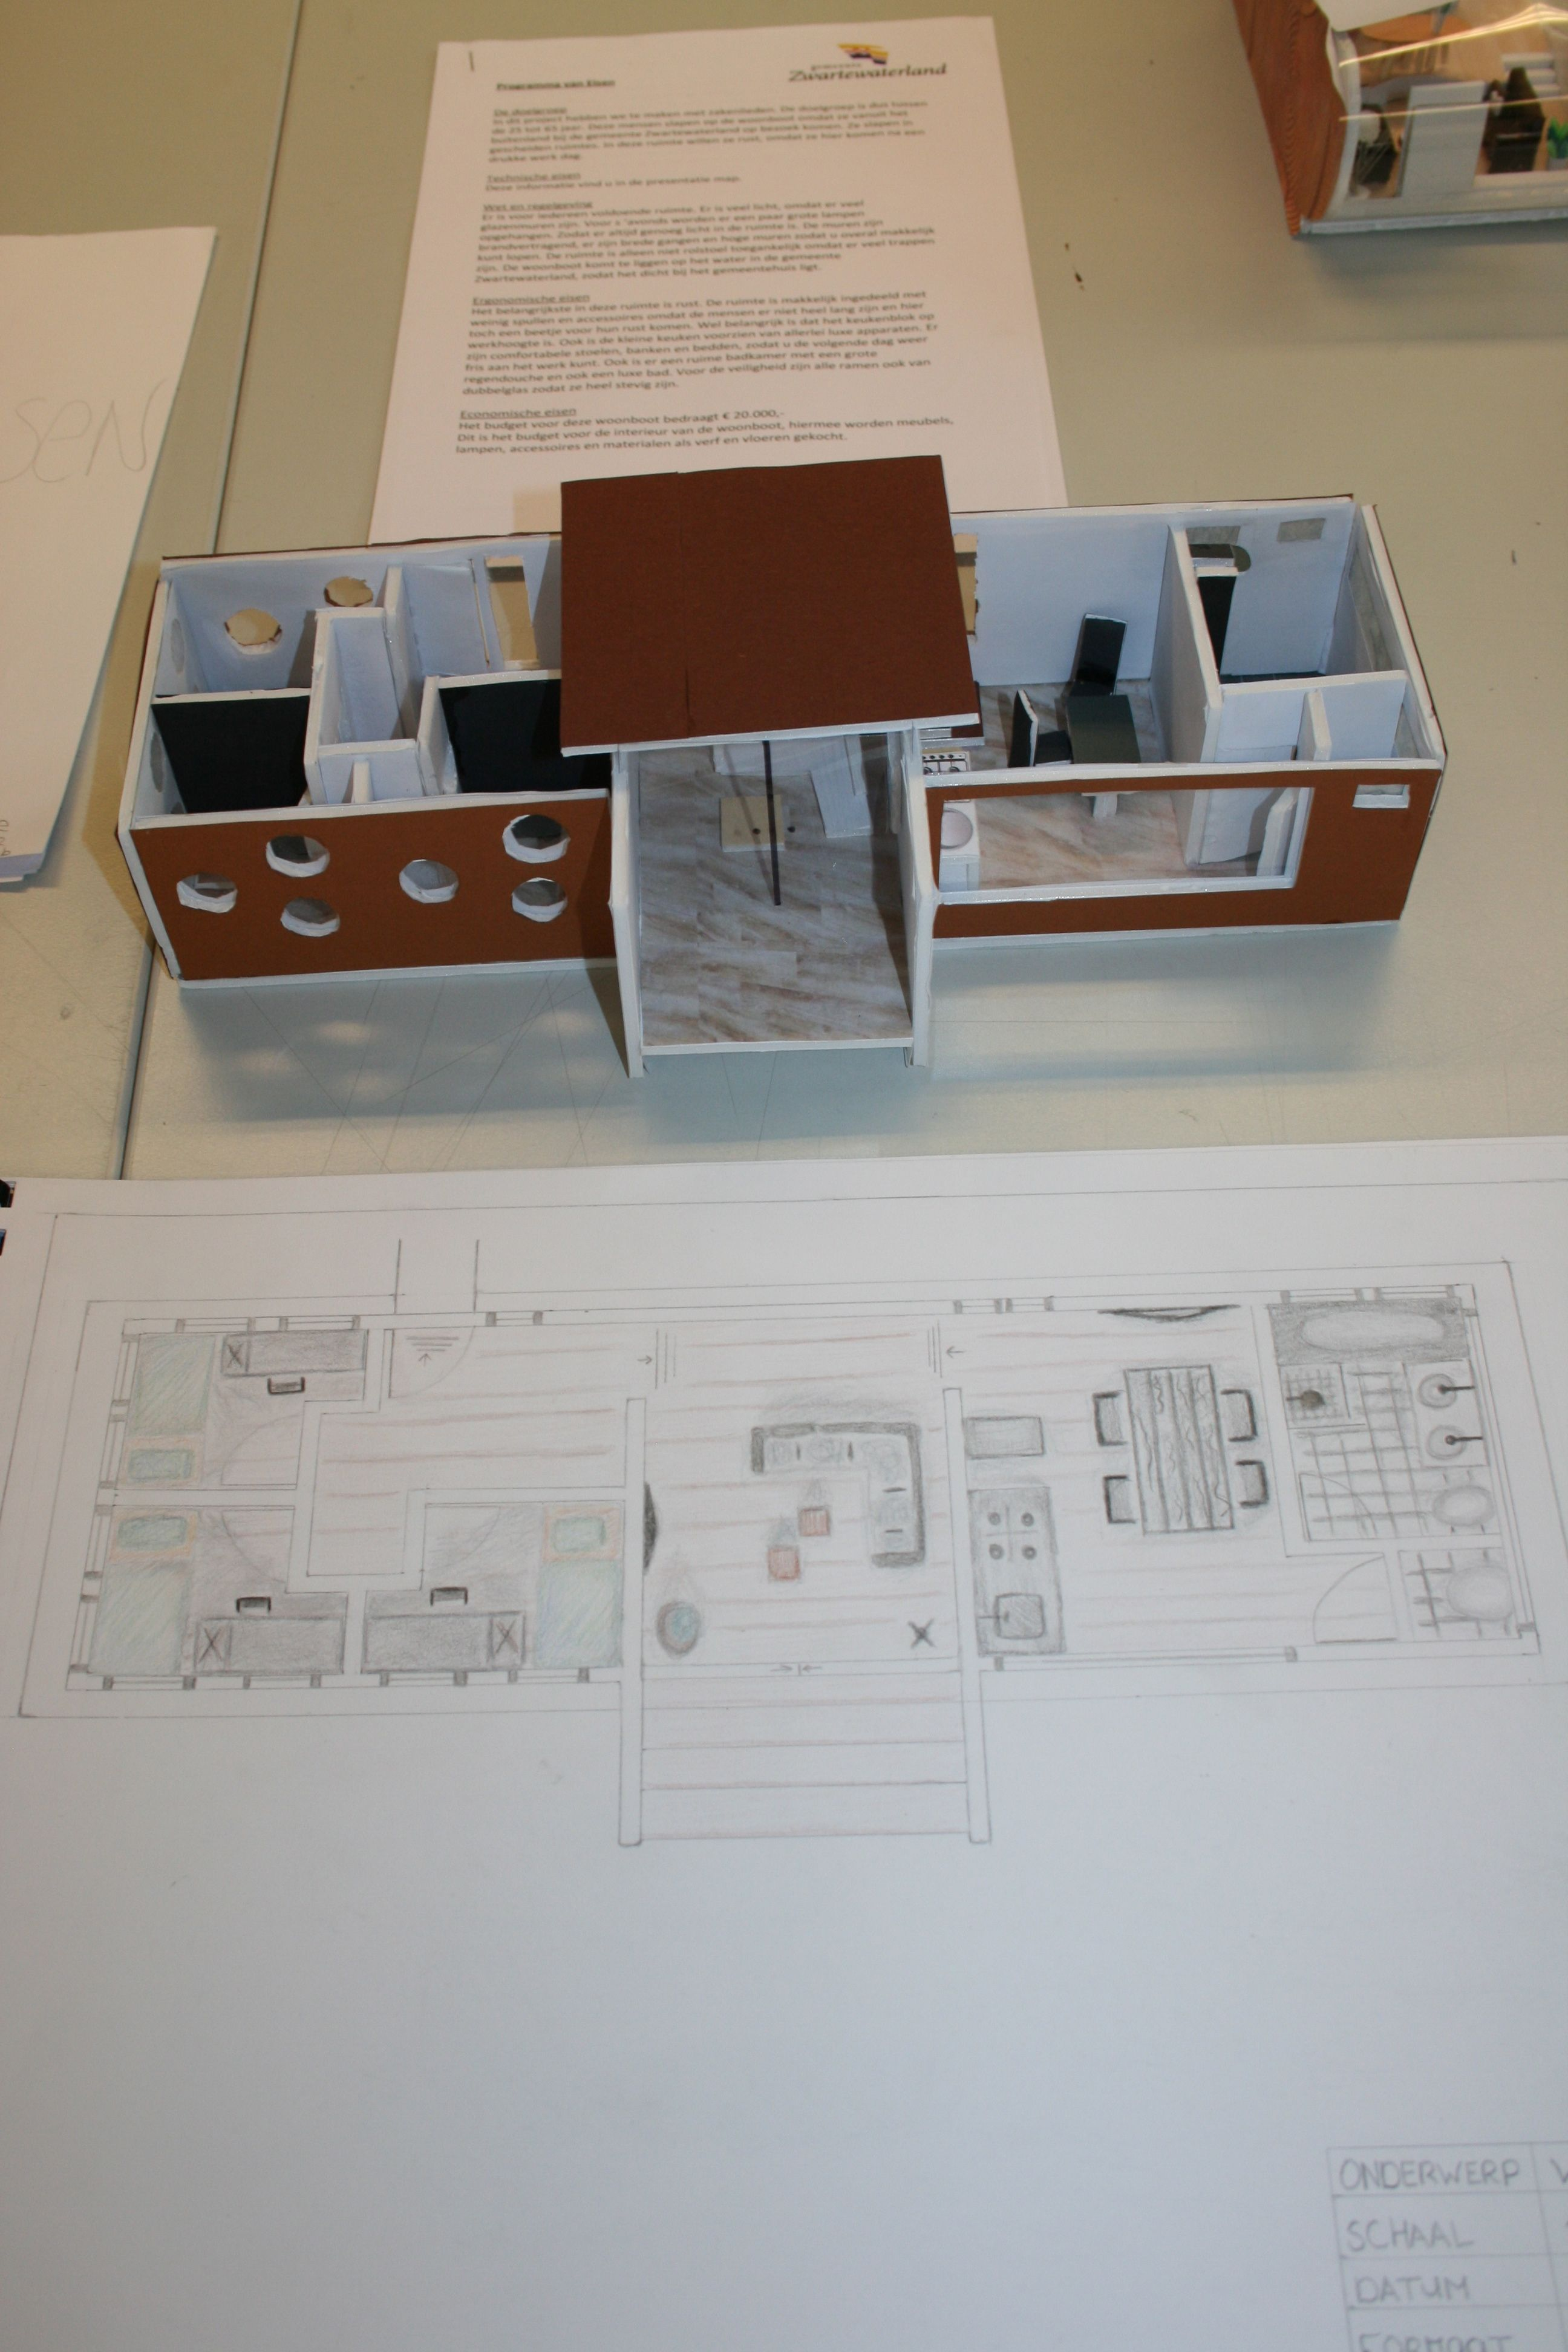 2e jaar woonboot project CIBAP interieur opleiding Zwolle | Cibap ...